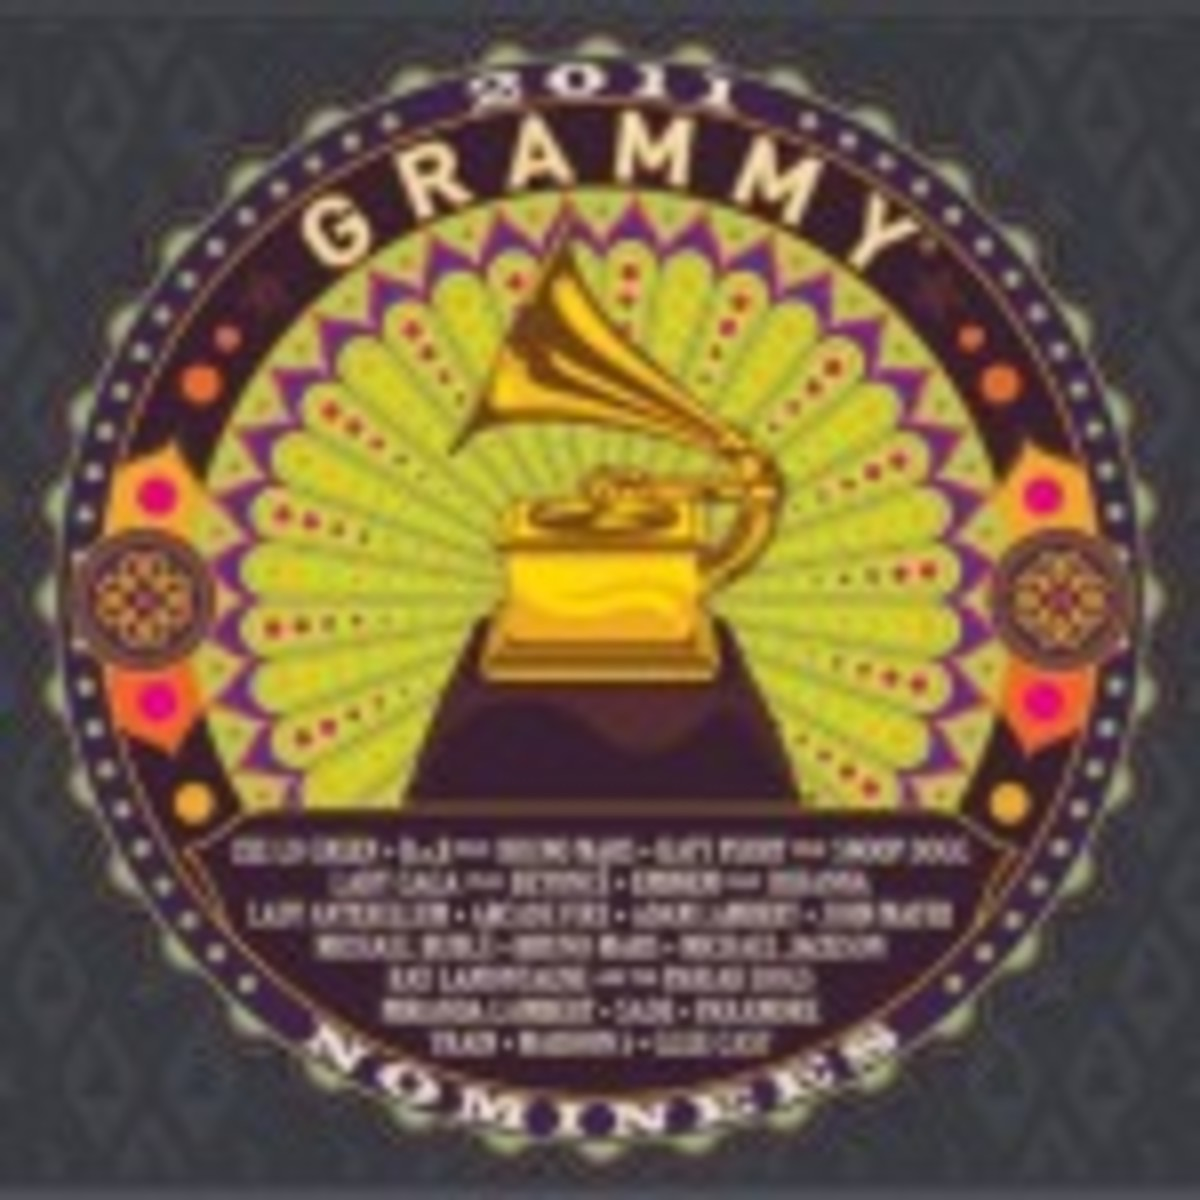 Grammy noms 2011 CD